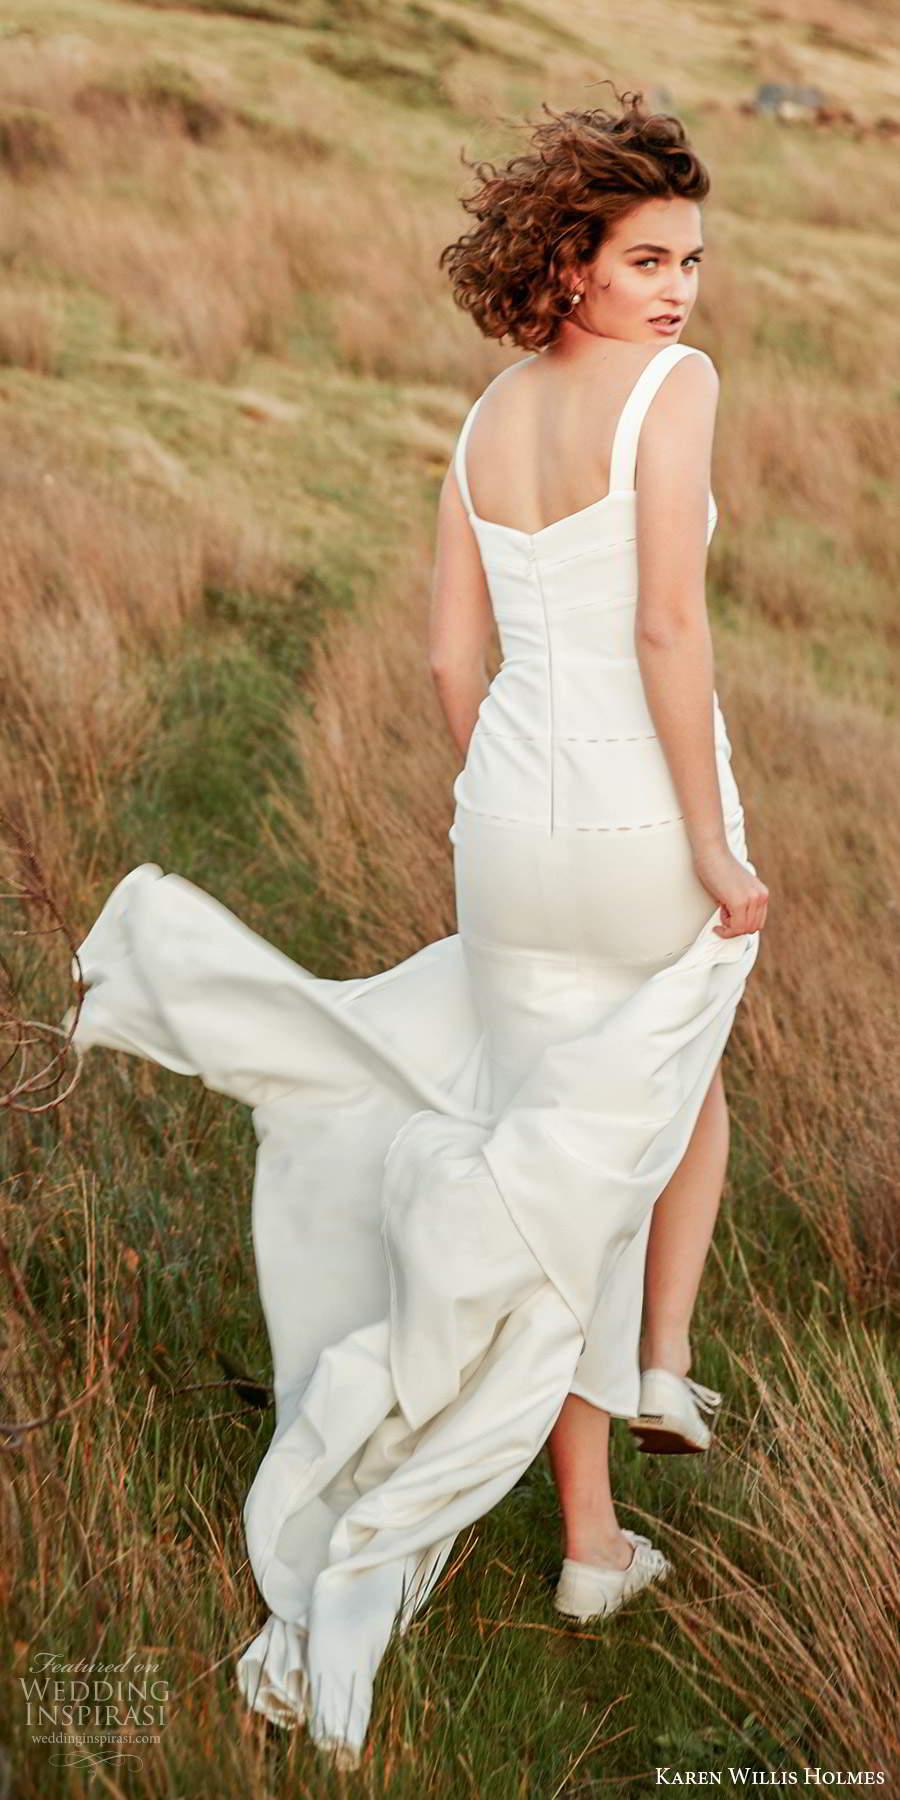 karen willis holmes 2020 bridal sleeveless thick straps straight across neckline clean minimally embellished fit flare mermaid wedding dress slit skirt sweep train (5) bv